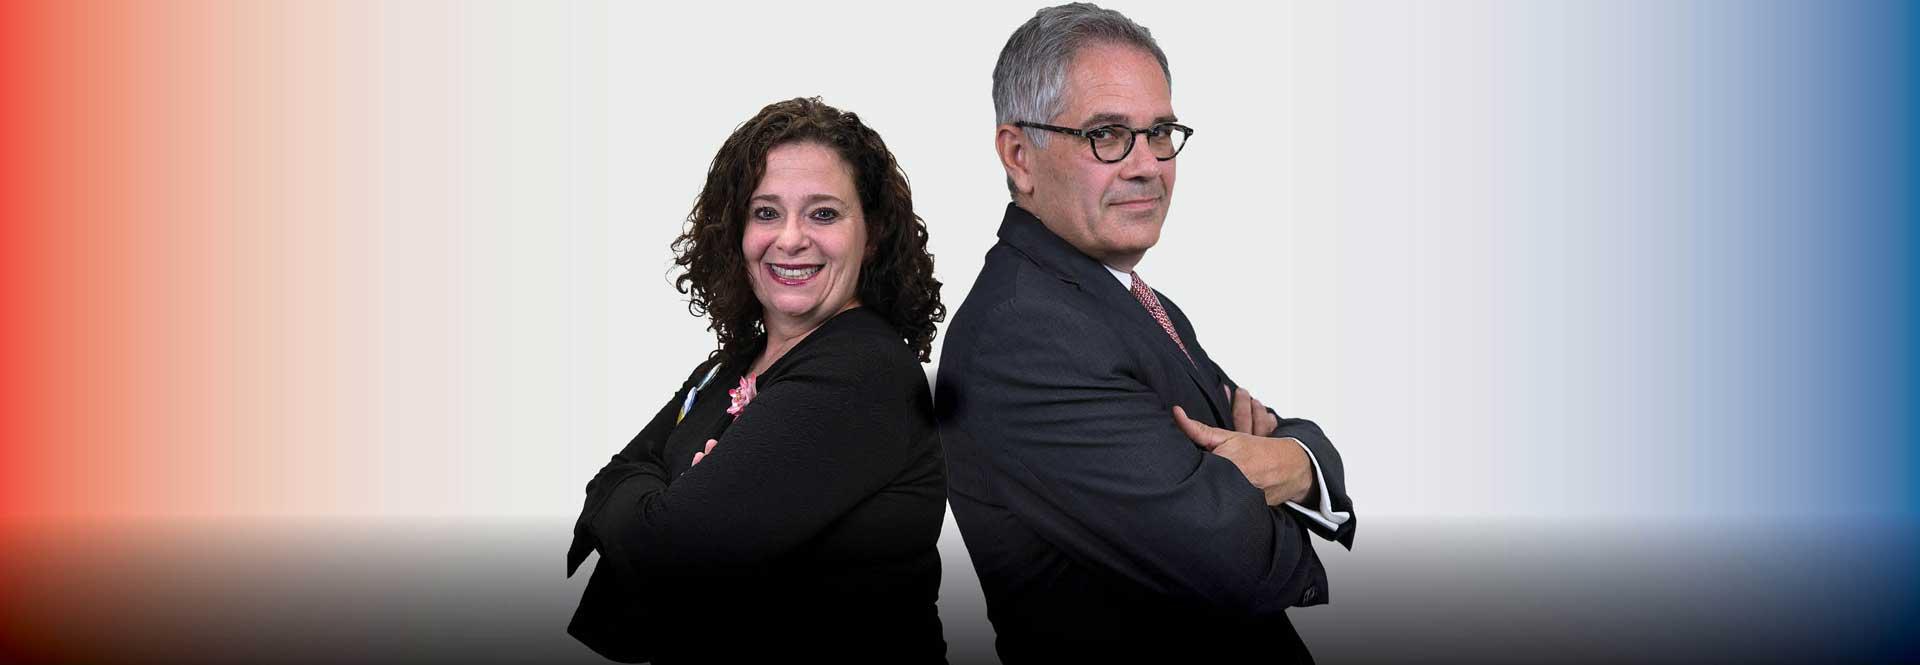 Beth Grossman (Republican)y Larry Krasner (Democrat) are the two candidates for Philadelphia District Attorney. Samantha Laub / AL DÍA News